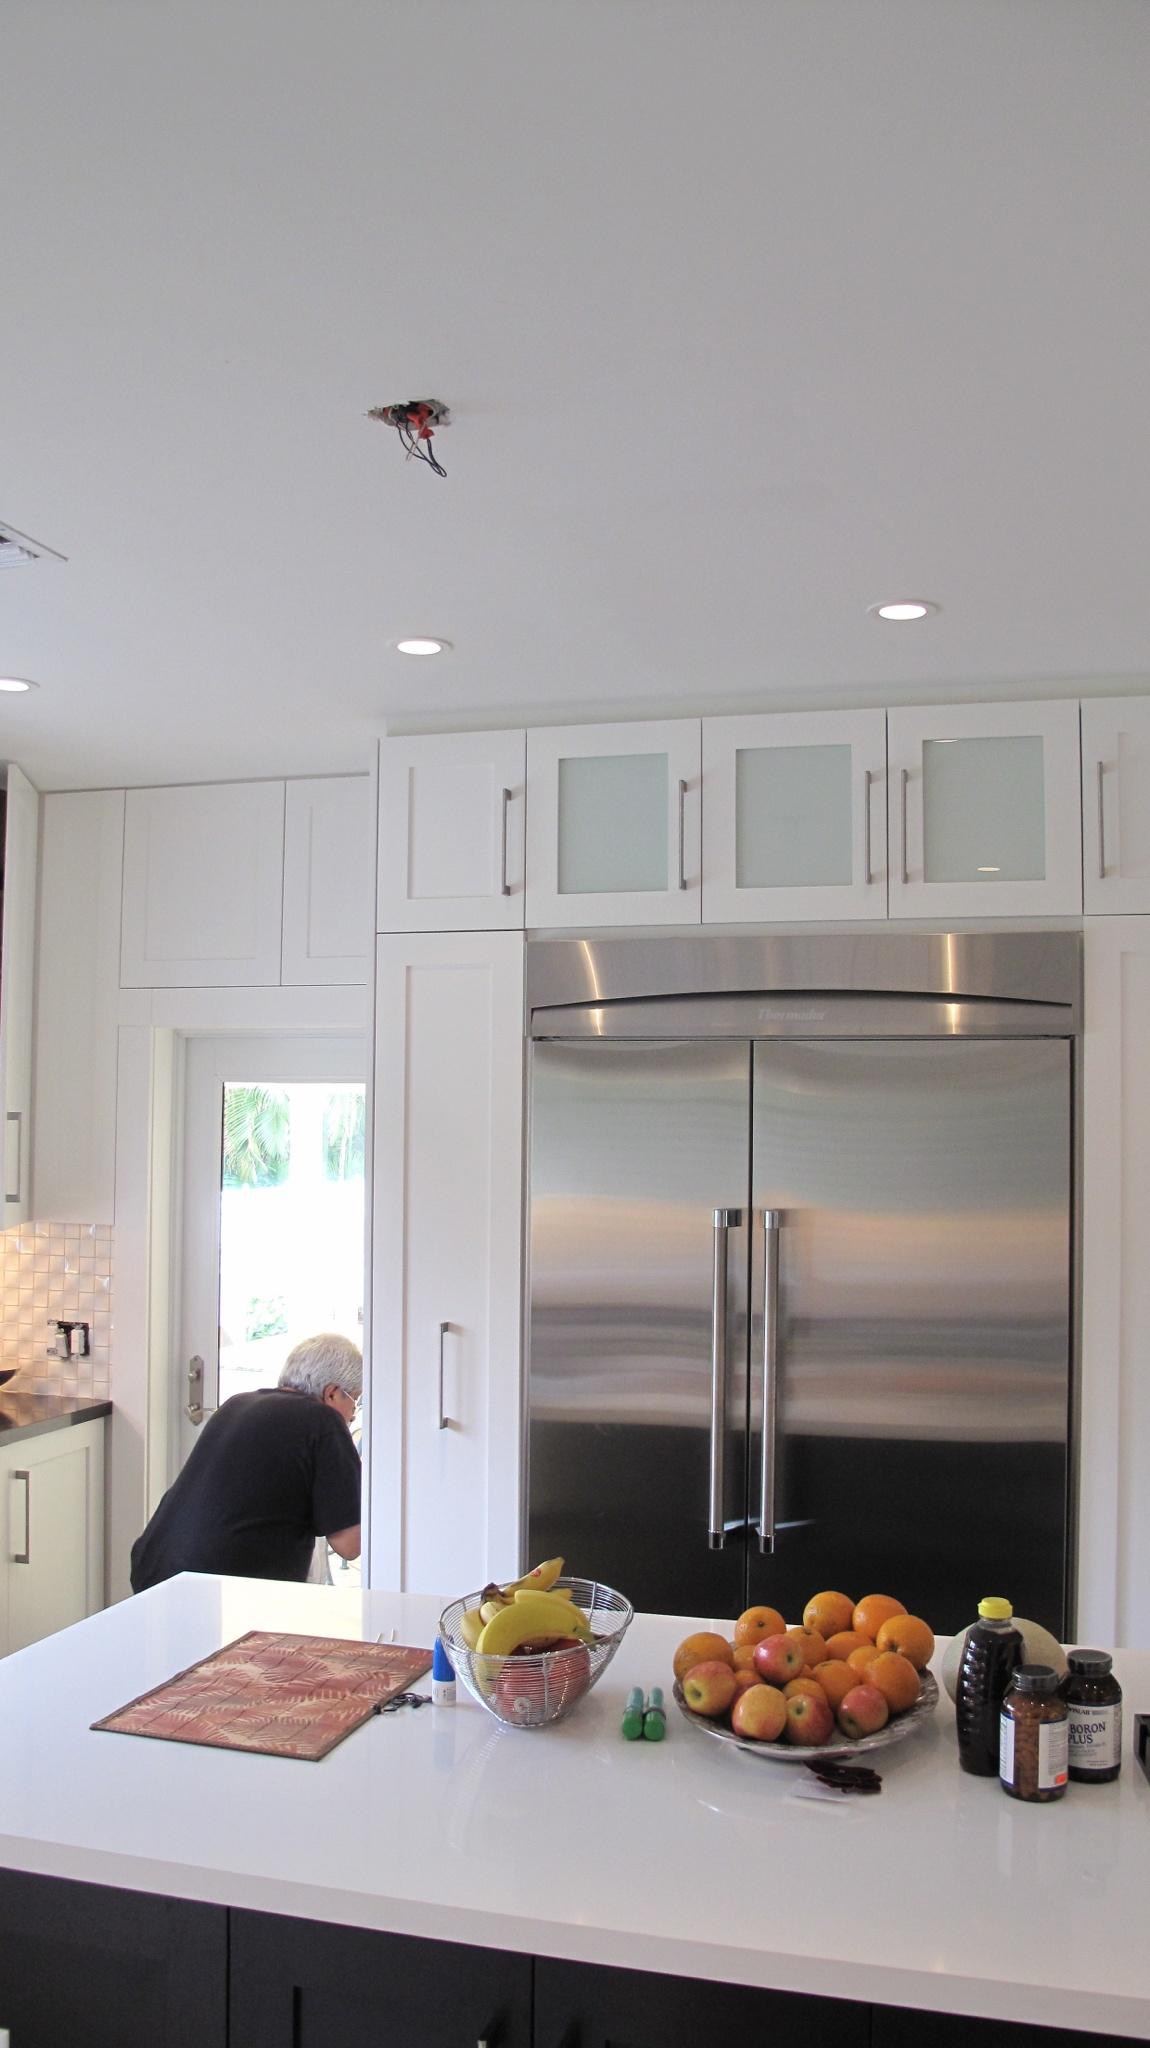 Kitchens-123.jpg